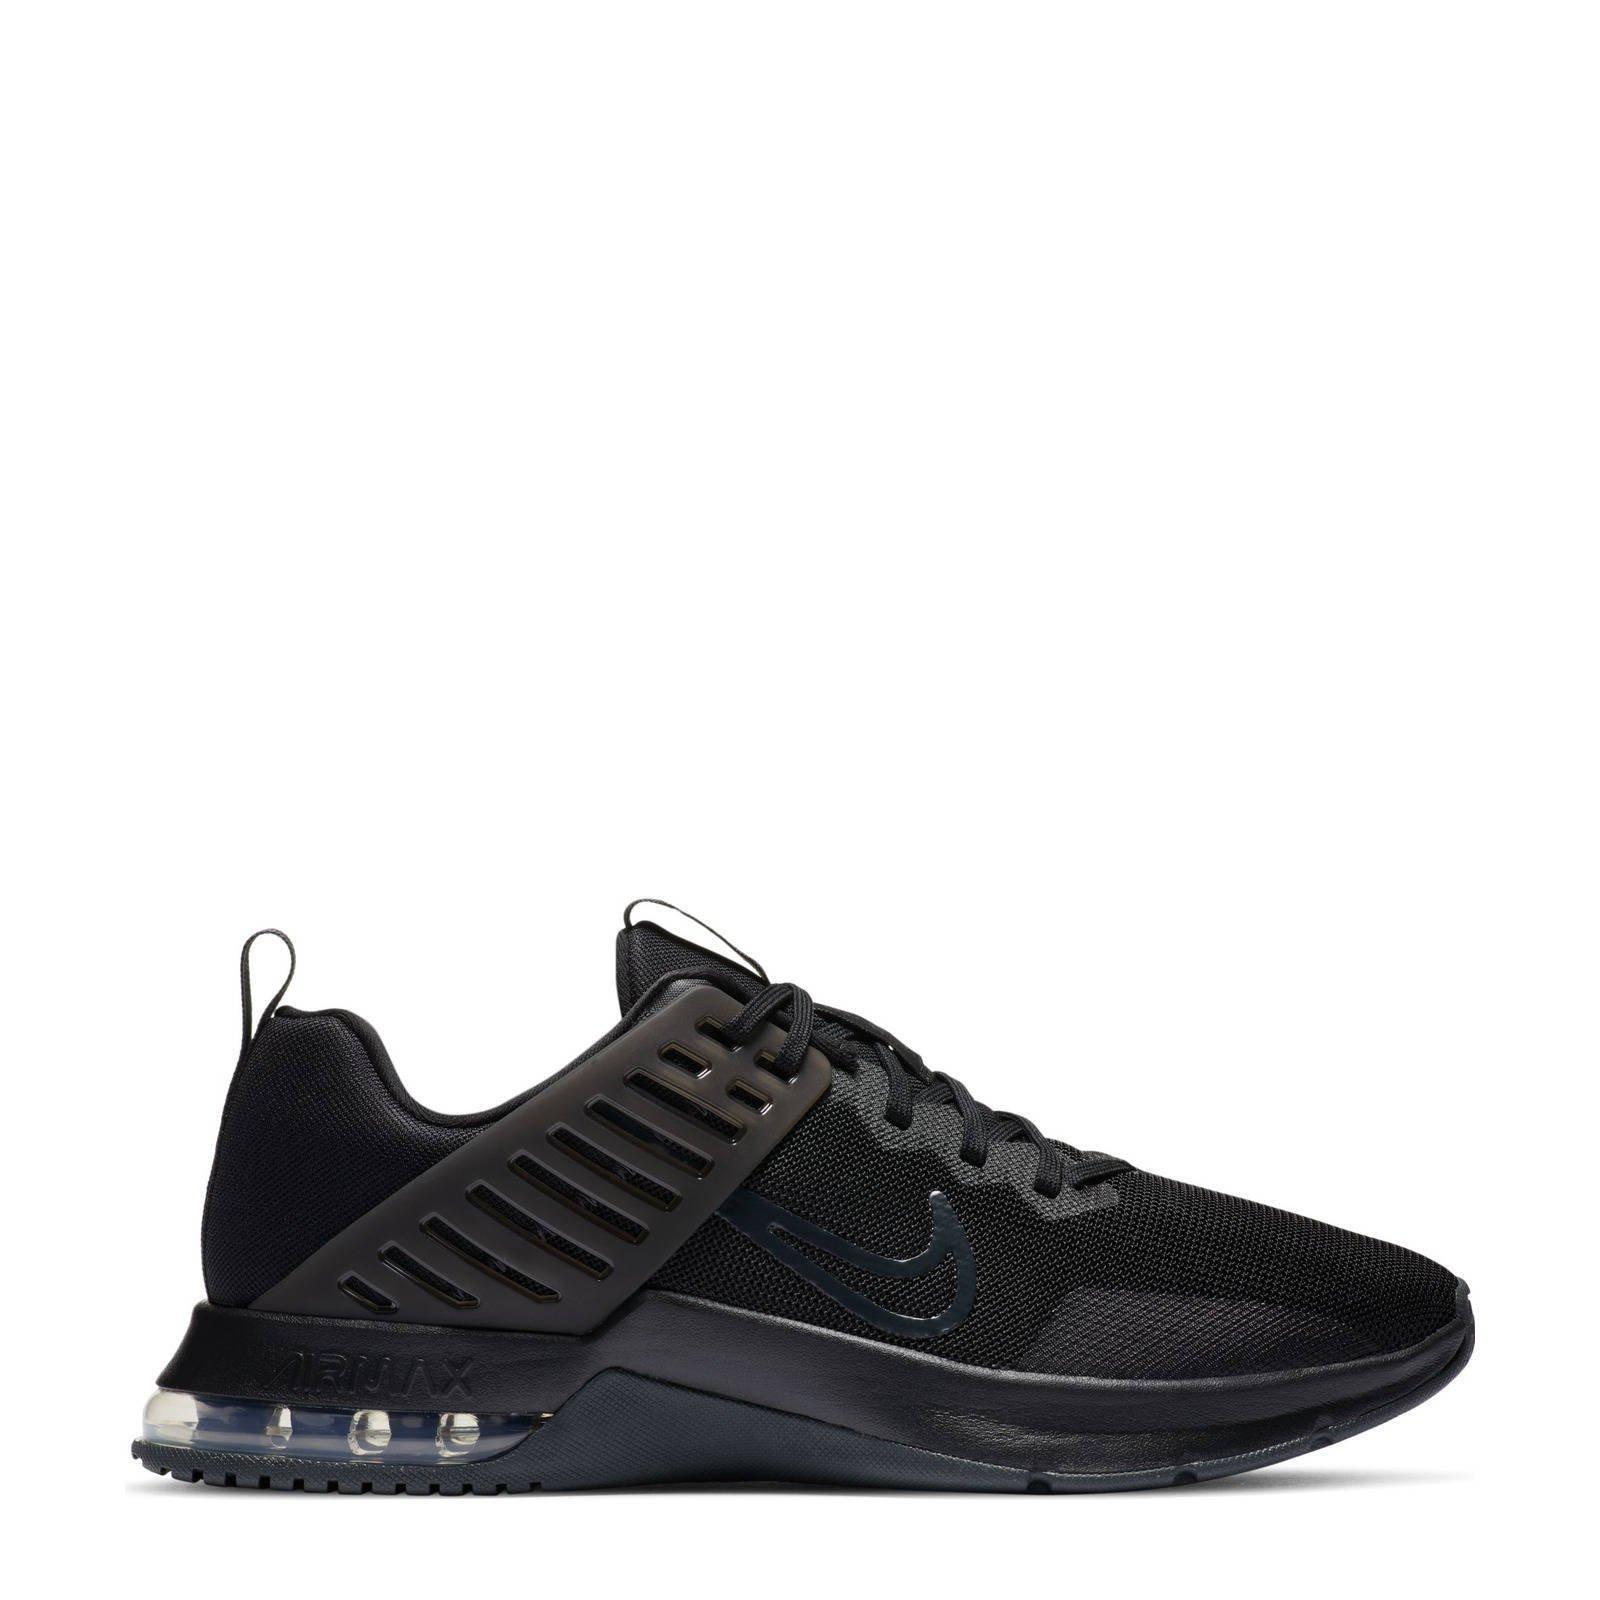 Nike Air Max Alpha Trainer 3 fitness schoenen zwart online kopen